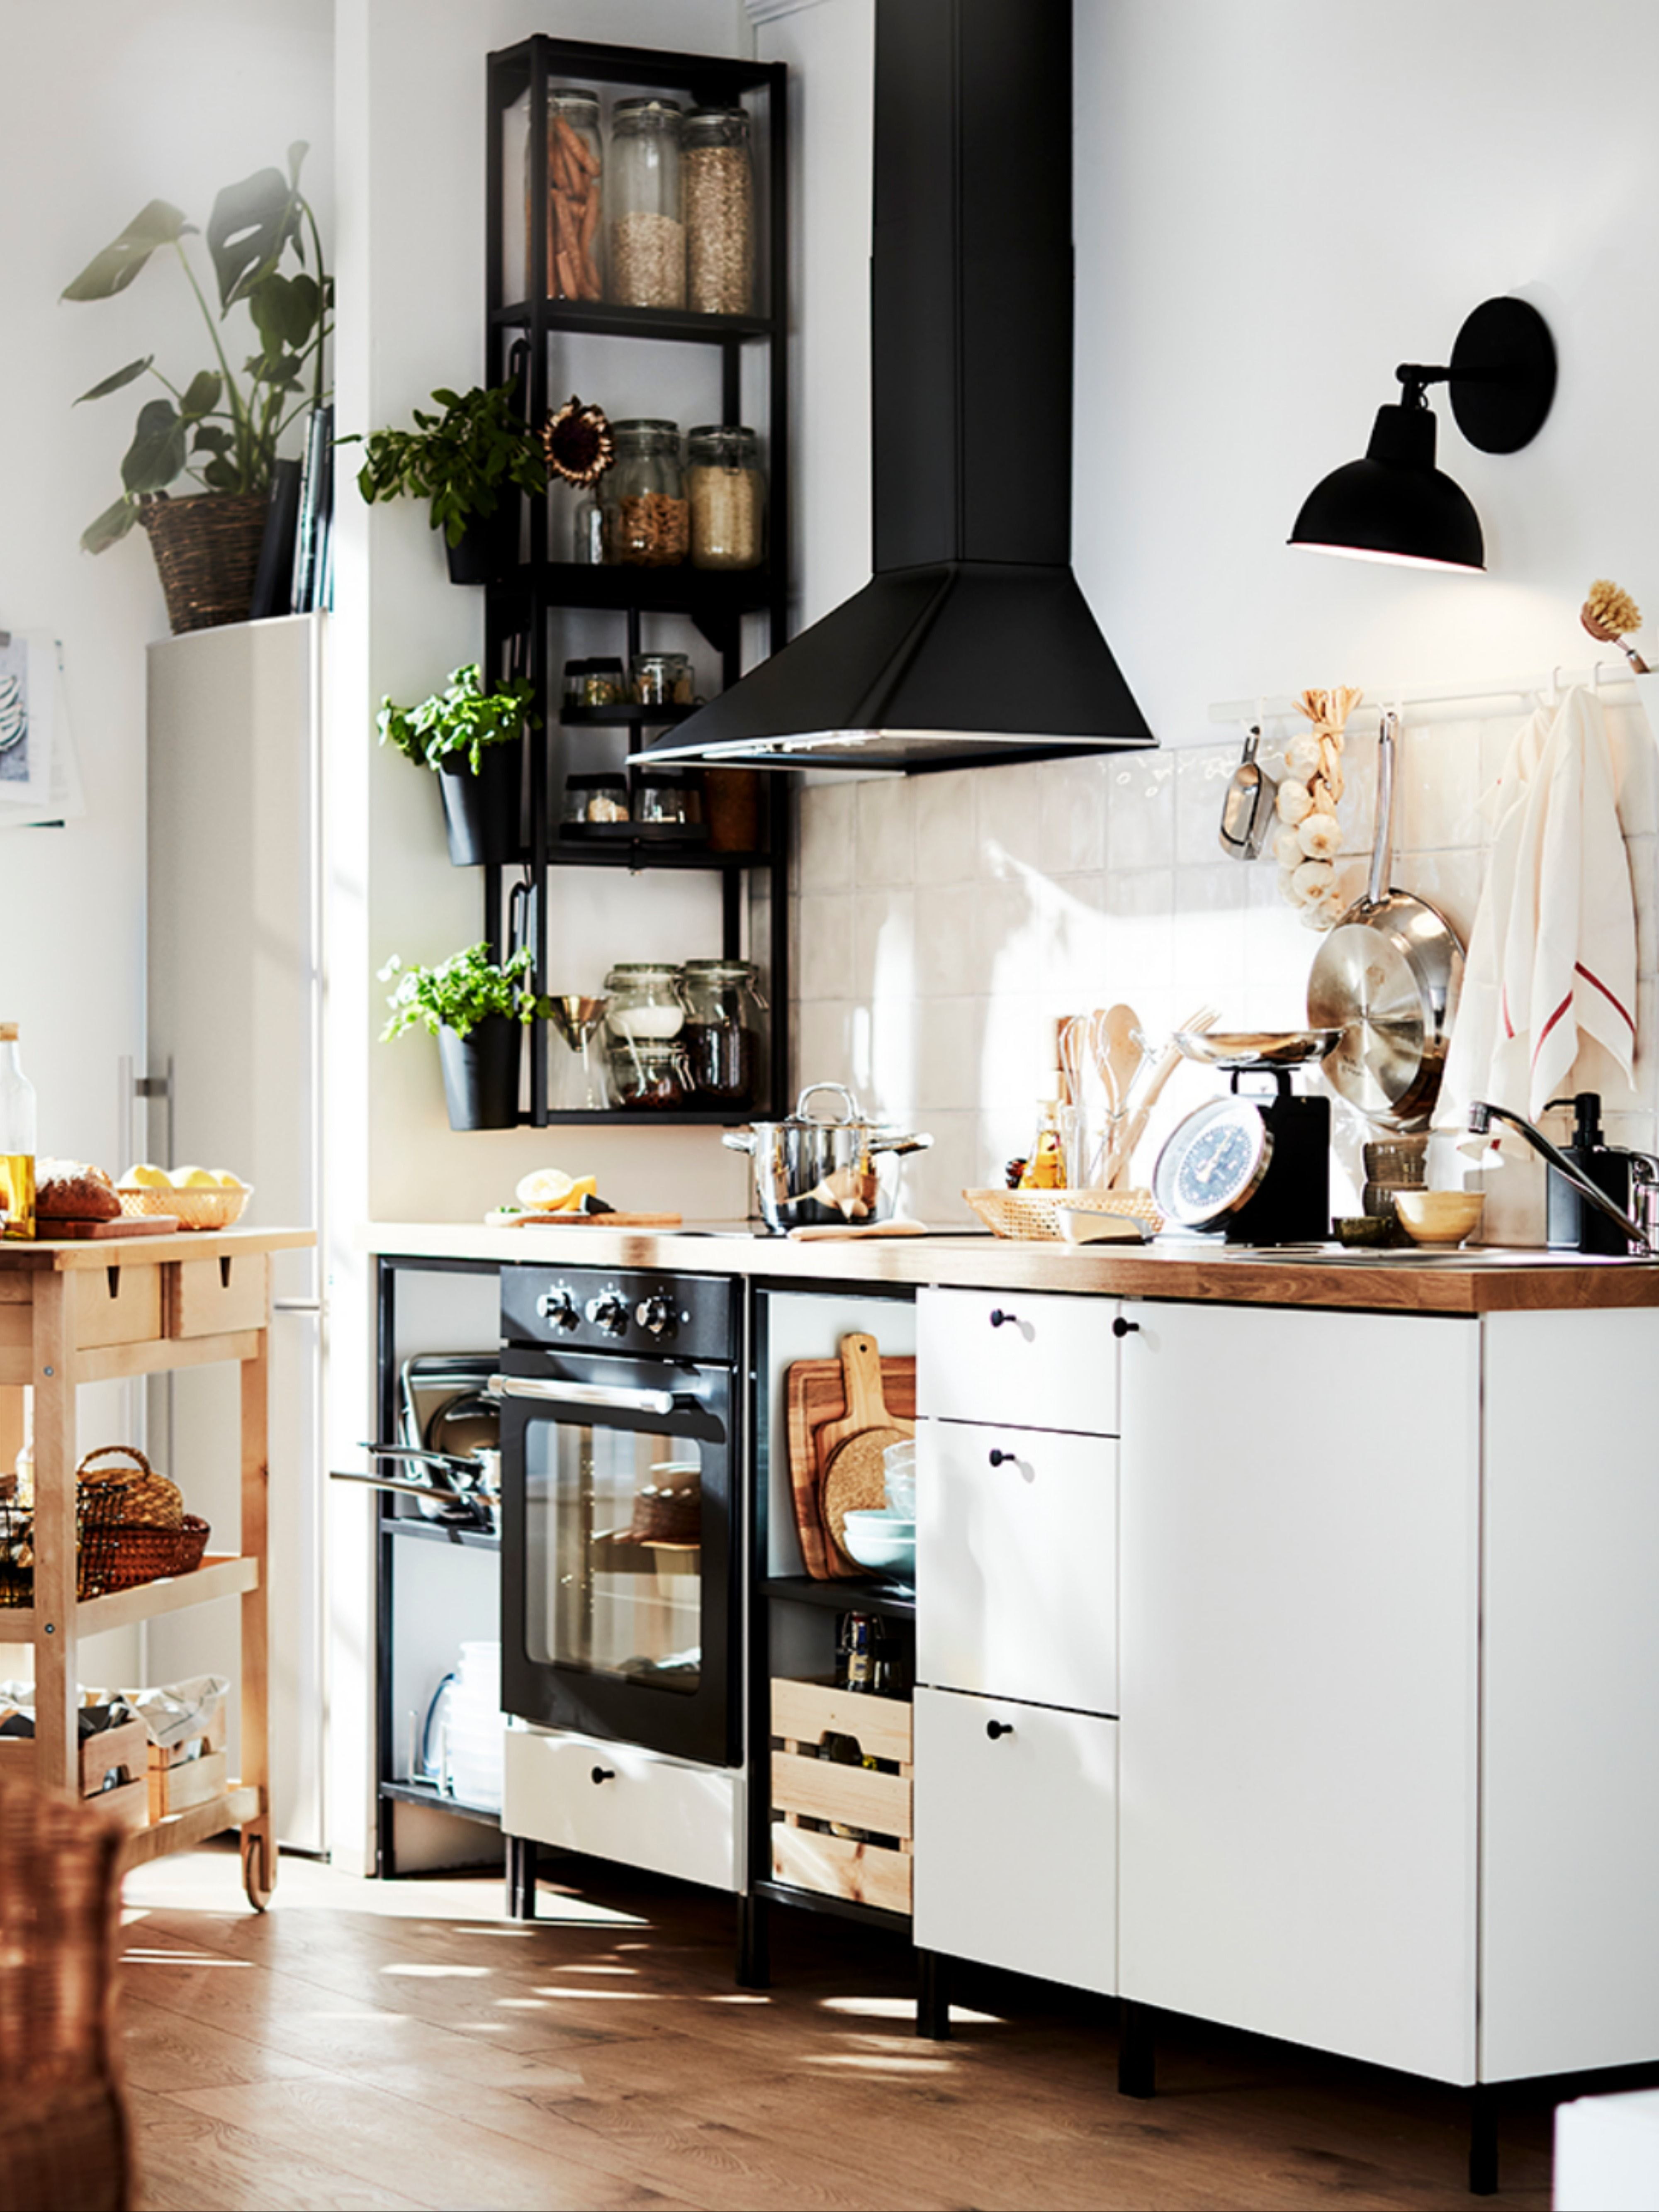 Easy ways to refresh a kitchen on a budget under £1,000